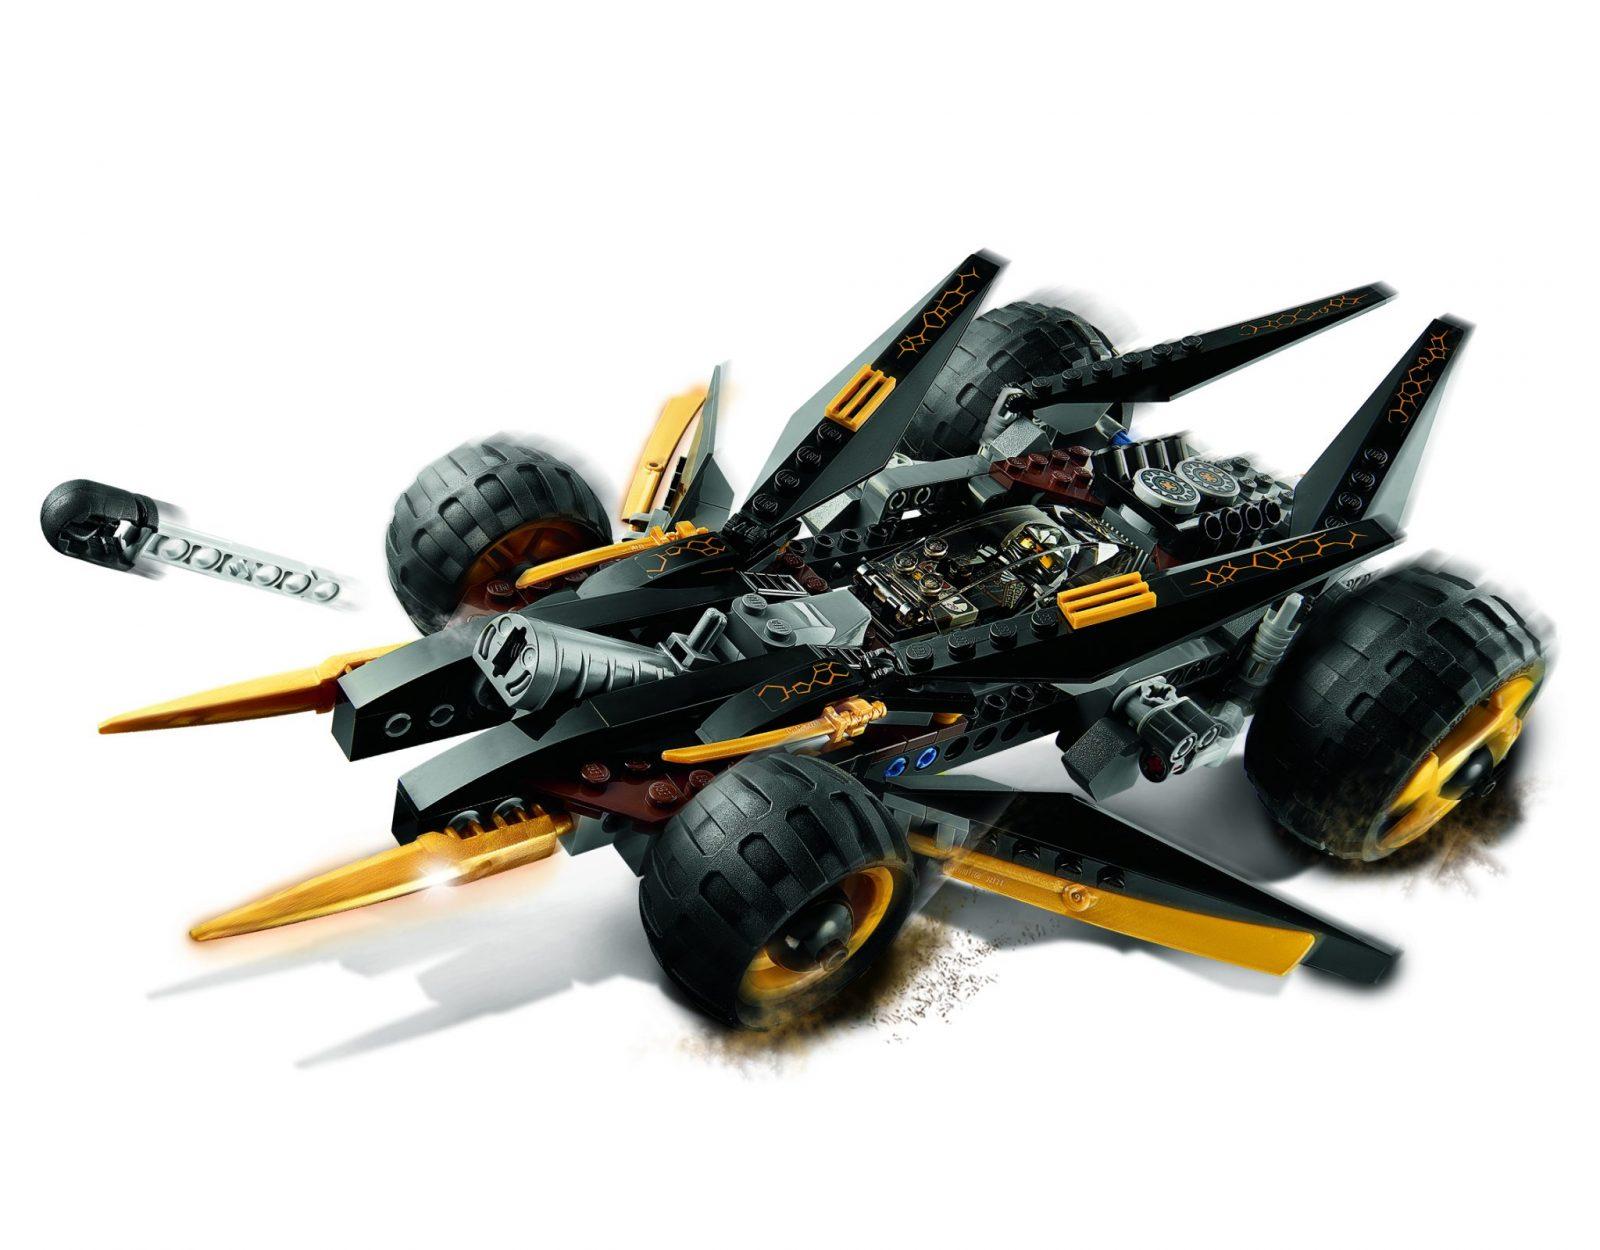 Lego Ninjago Cole's Tread Assault Review